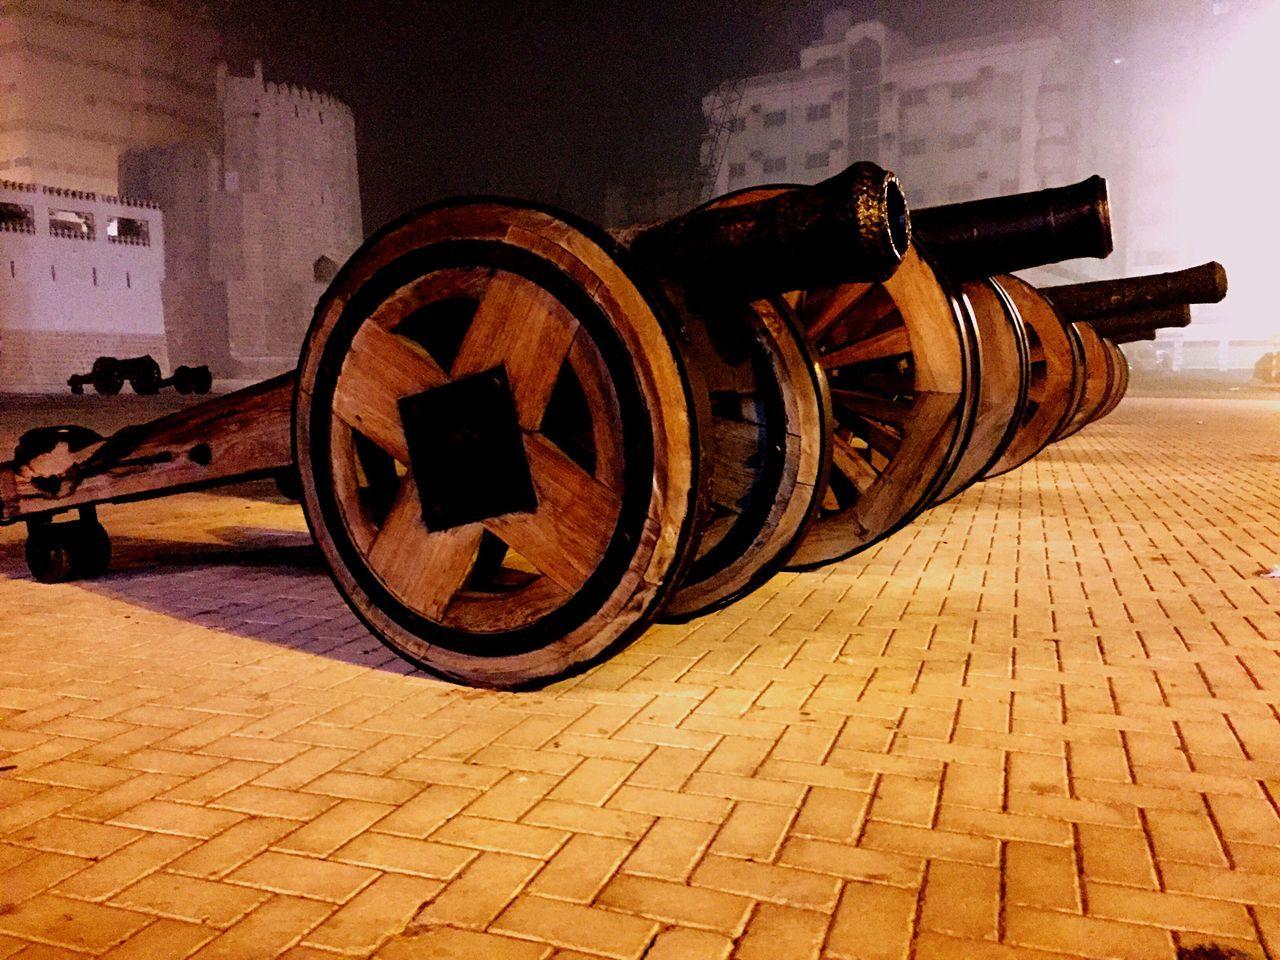 Sharjah Museum Weapons Of War Nightlife Photoshoot Indian Culture  Mallugram Ksd Chekan